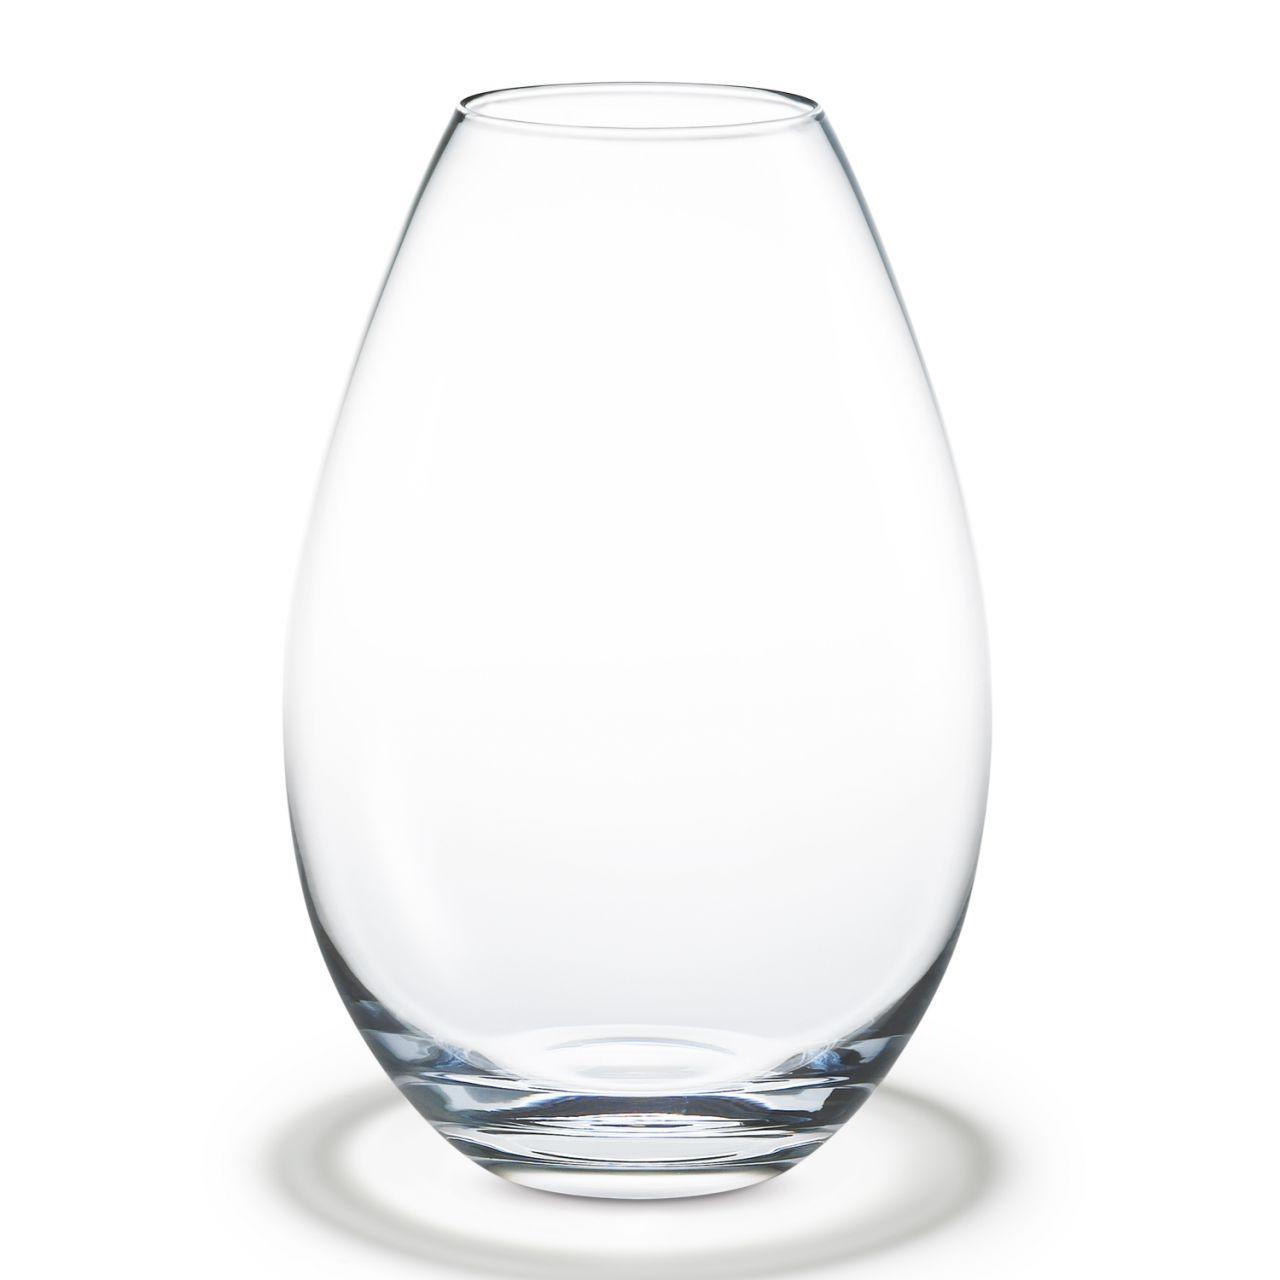 Holmegaard - Cocoon Vase 4343200